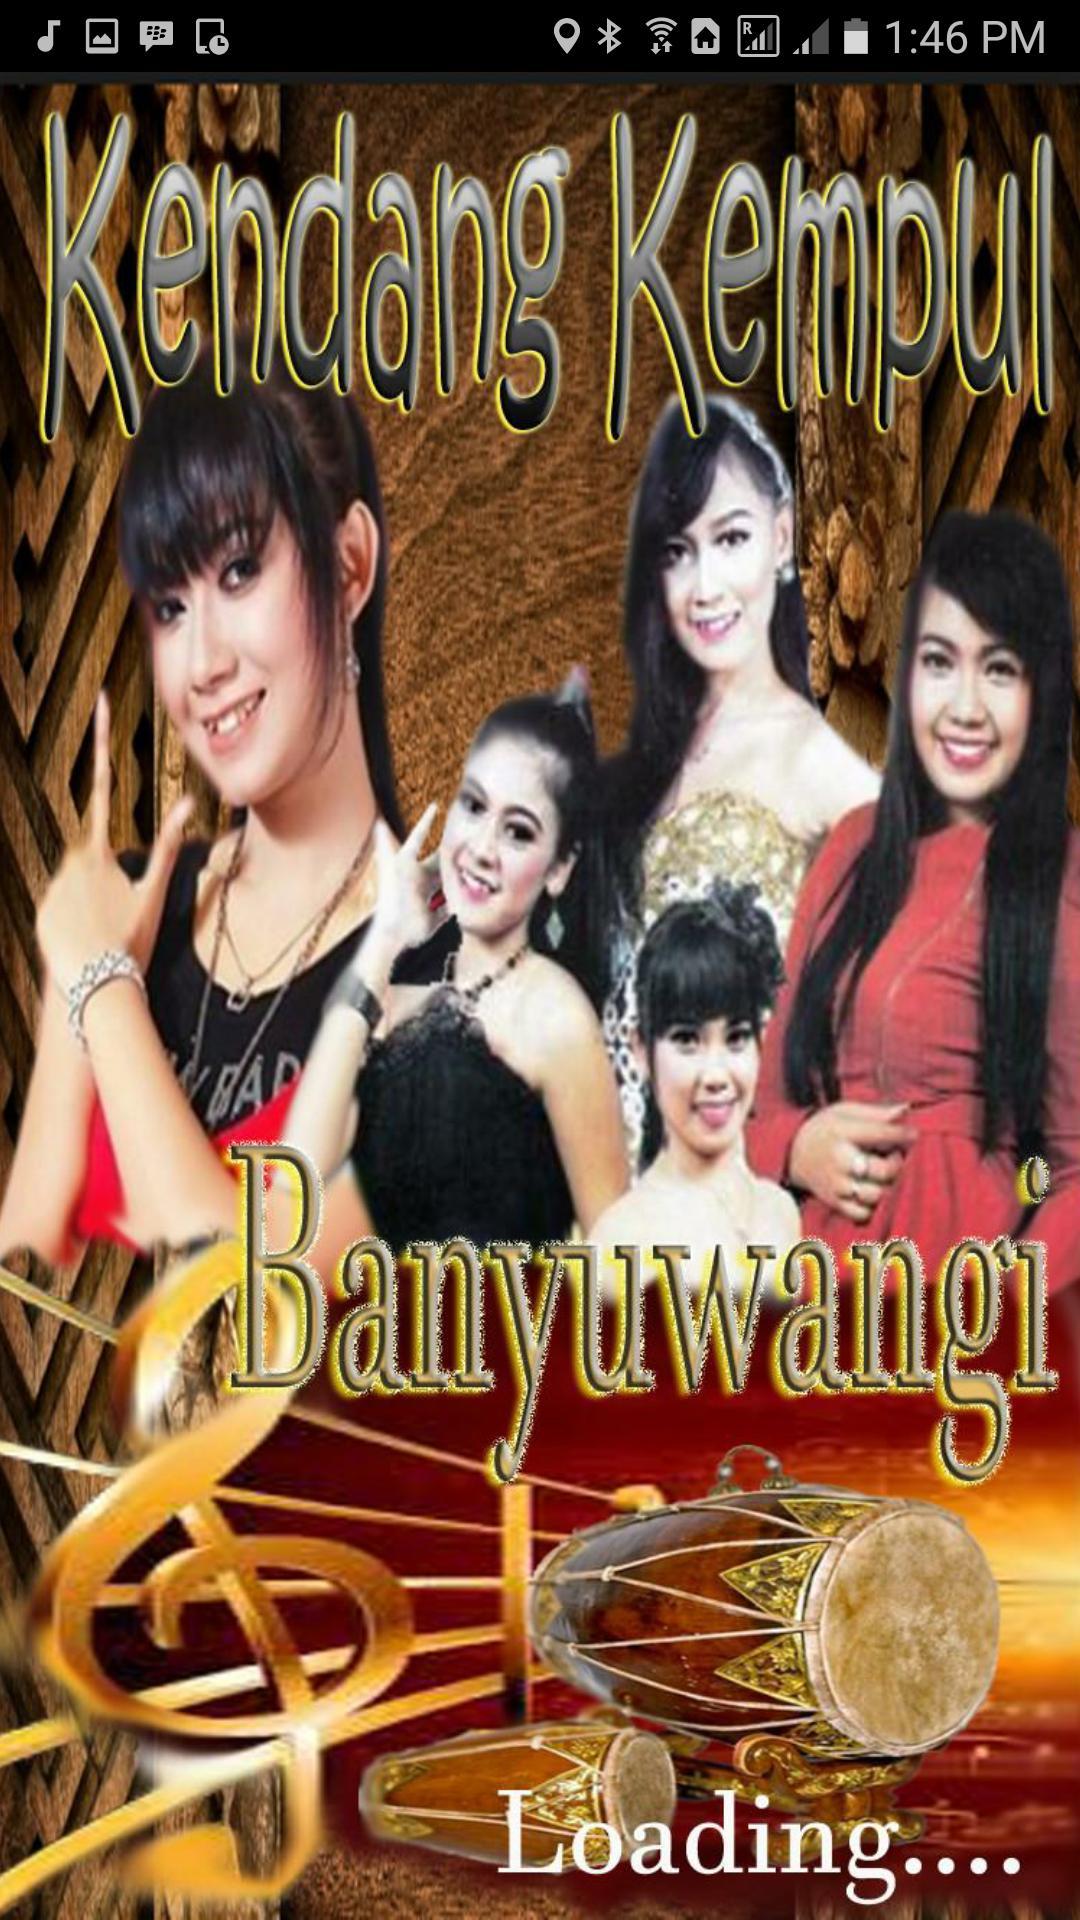 Kendang Kempul Banyuwangi For Android Apk Download